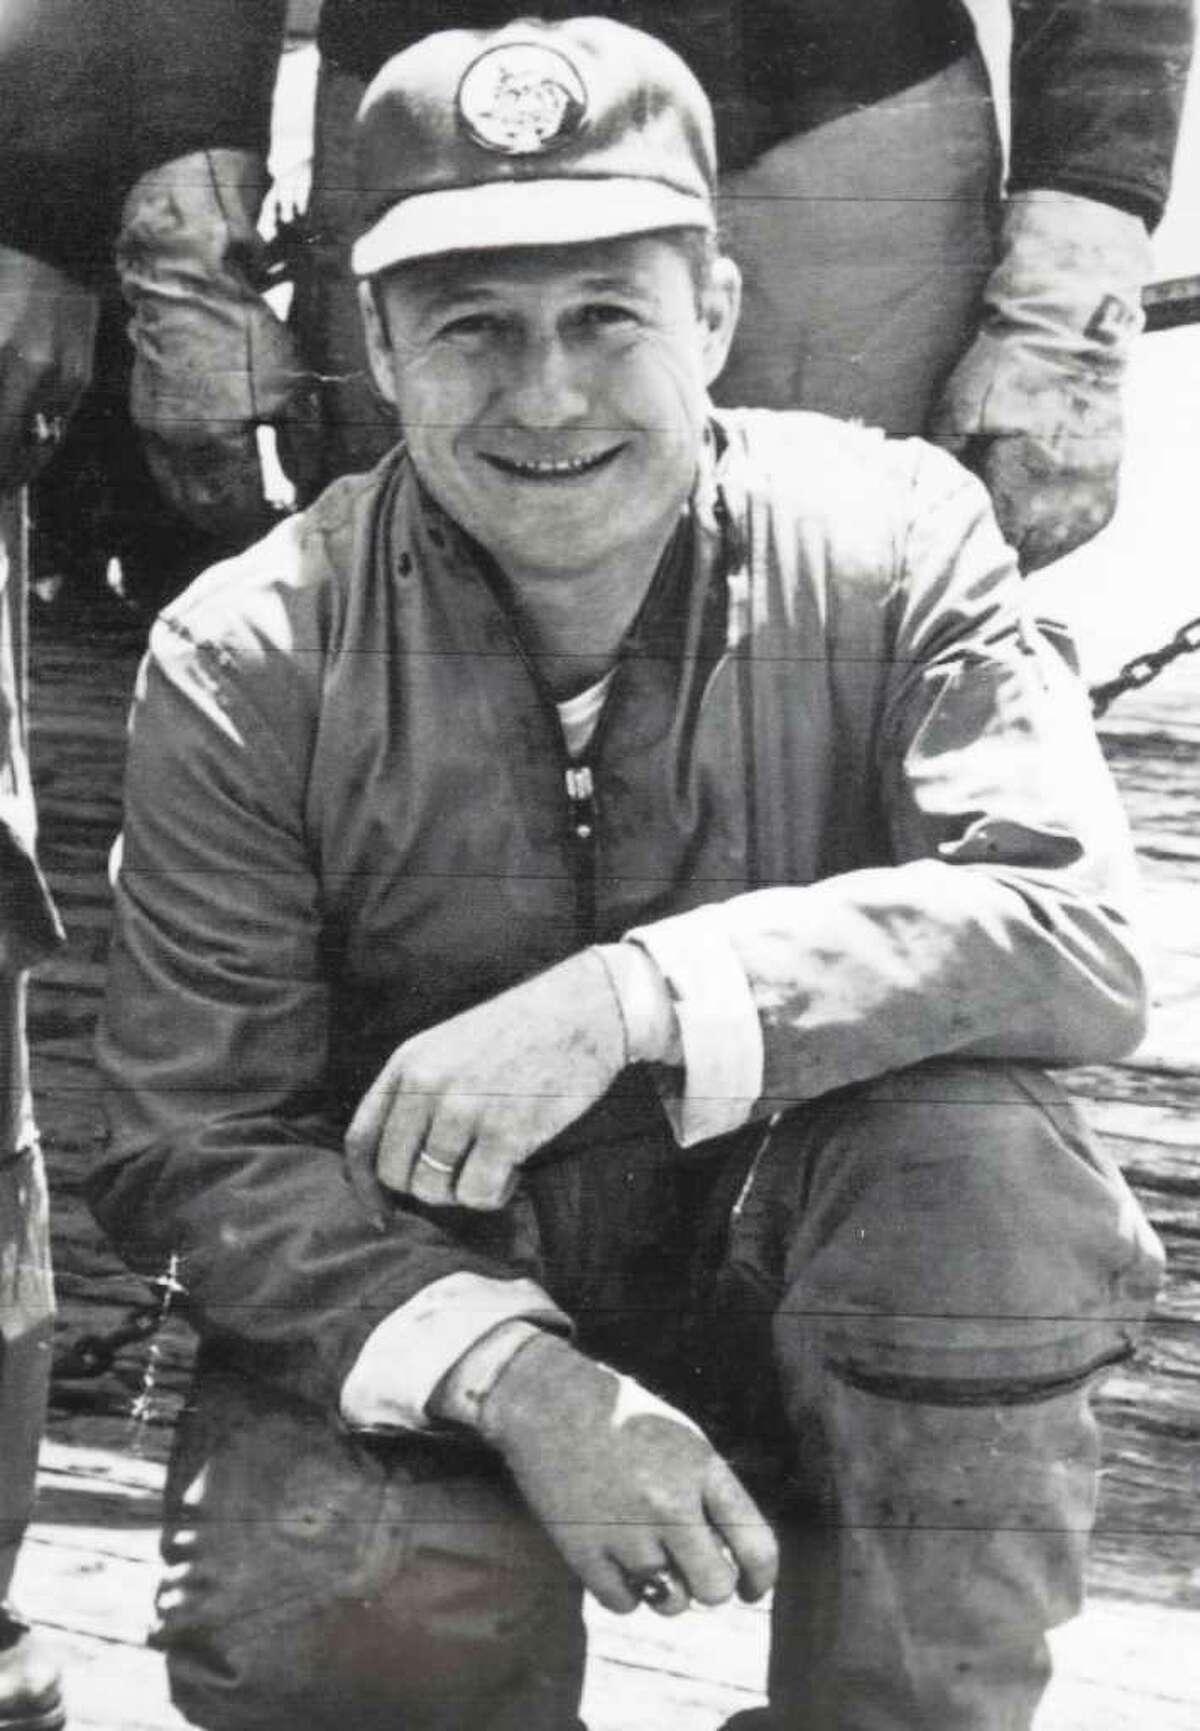 AUBIN FAMILY LOST AT SEA: Chief Petty Officer Joseph W. Aubin's remains were never found.